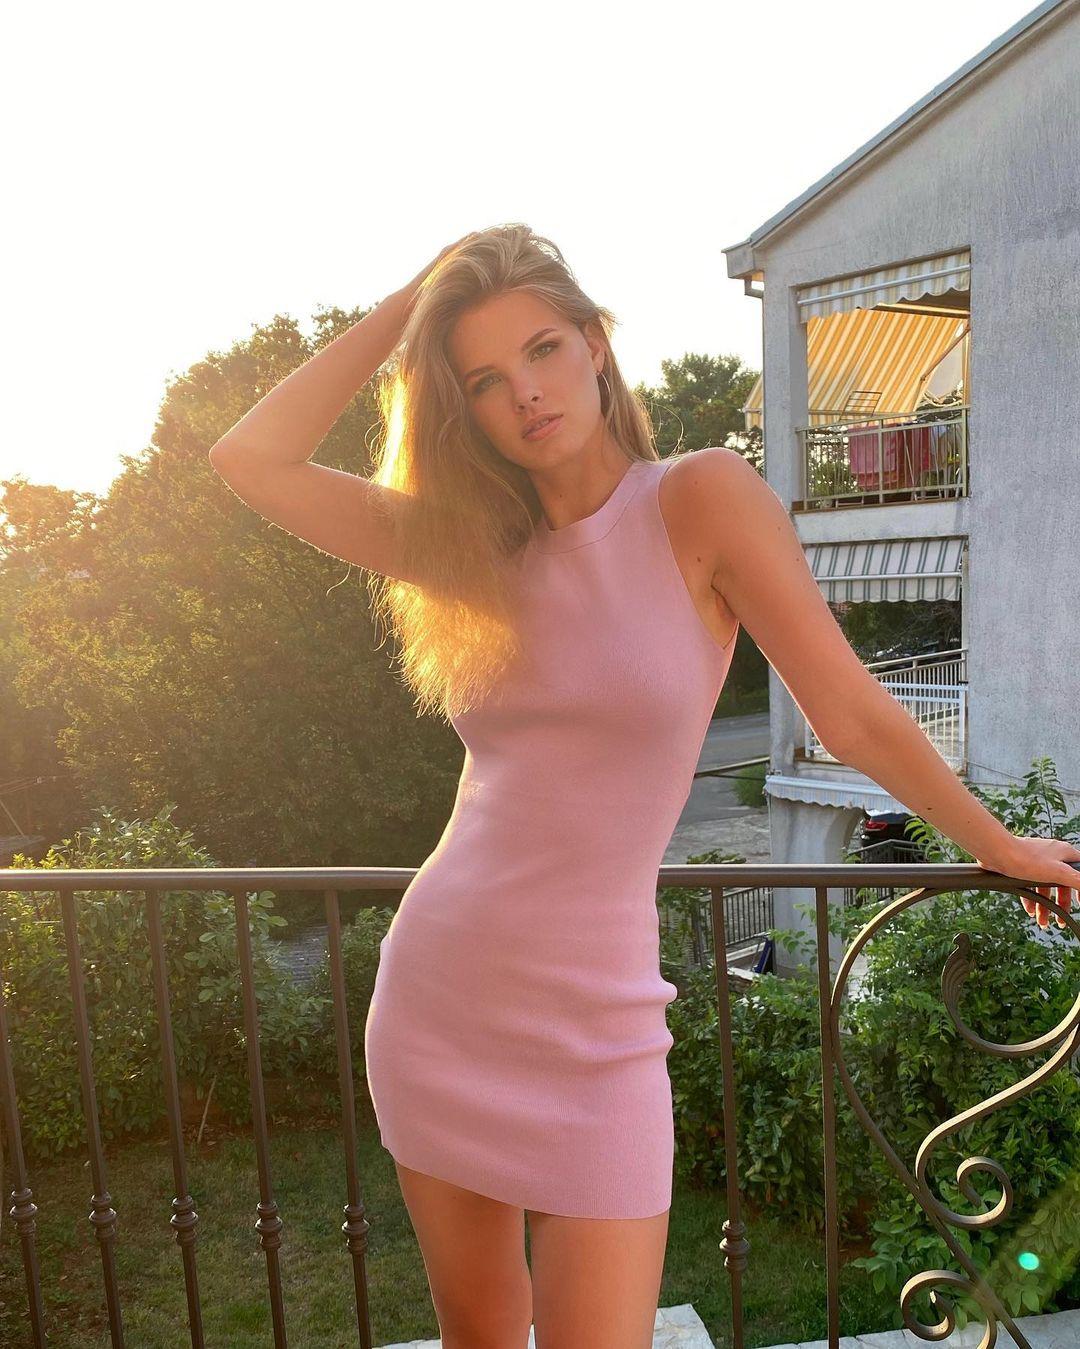 Mariia-Arsentieva-Wallpapers-Insta-Fit-Bio-1